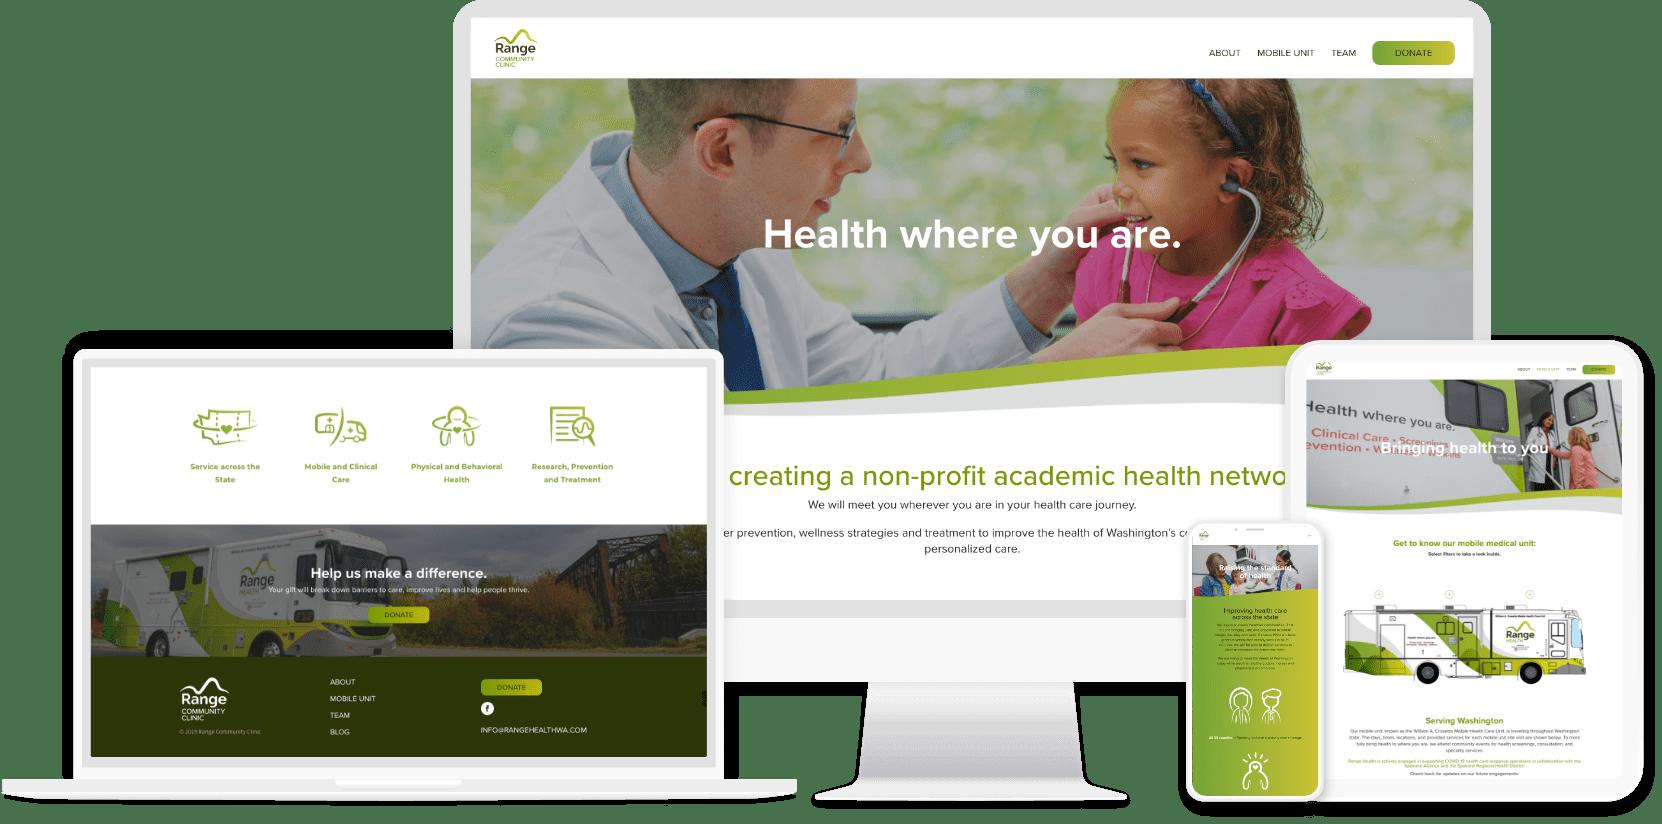 Range Community Clinic website design